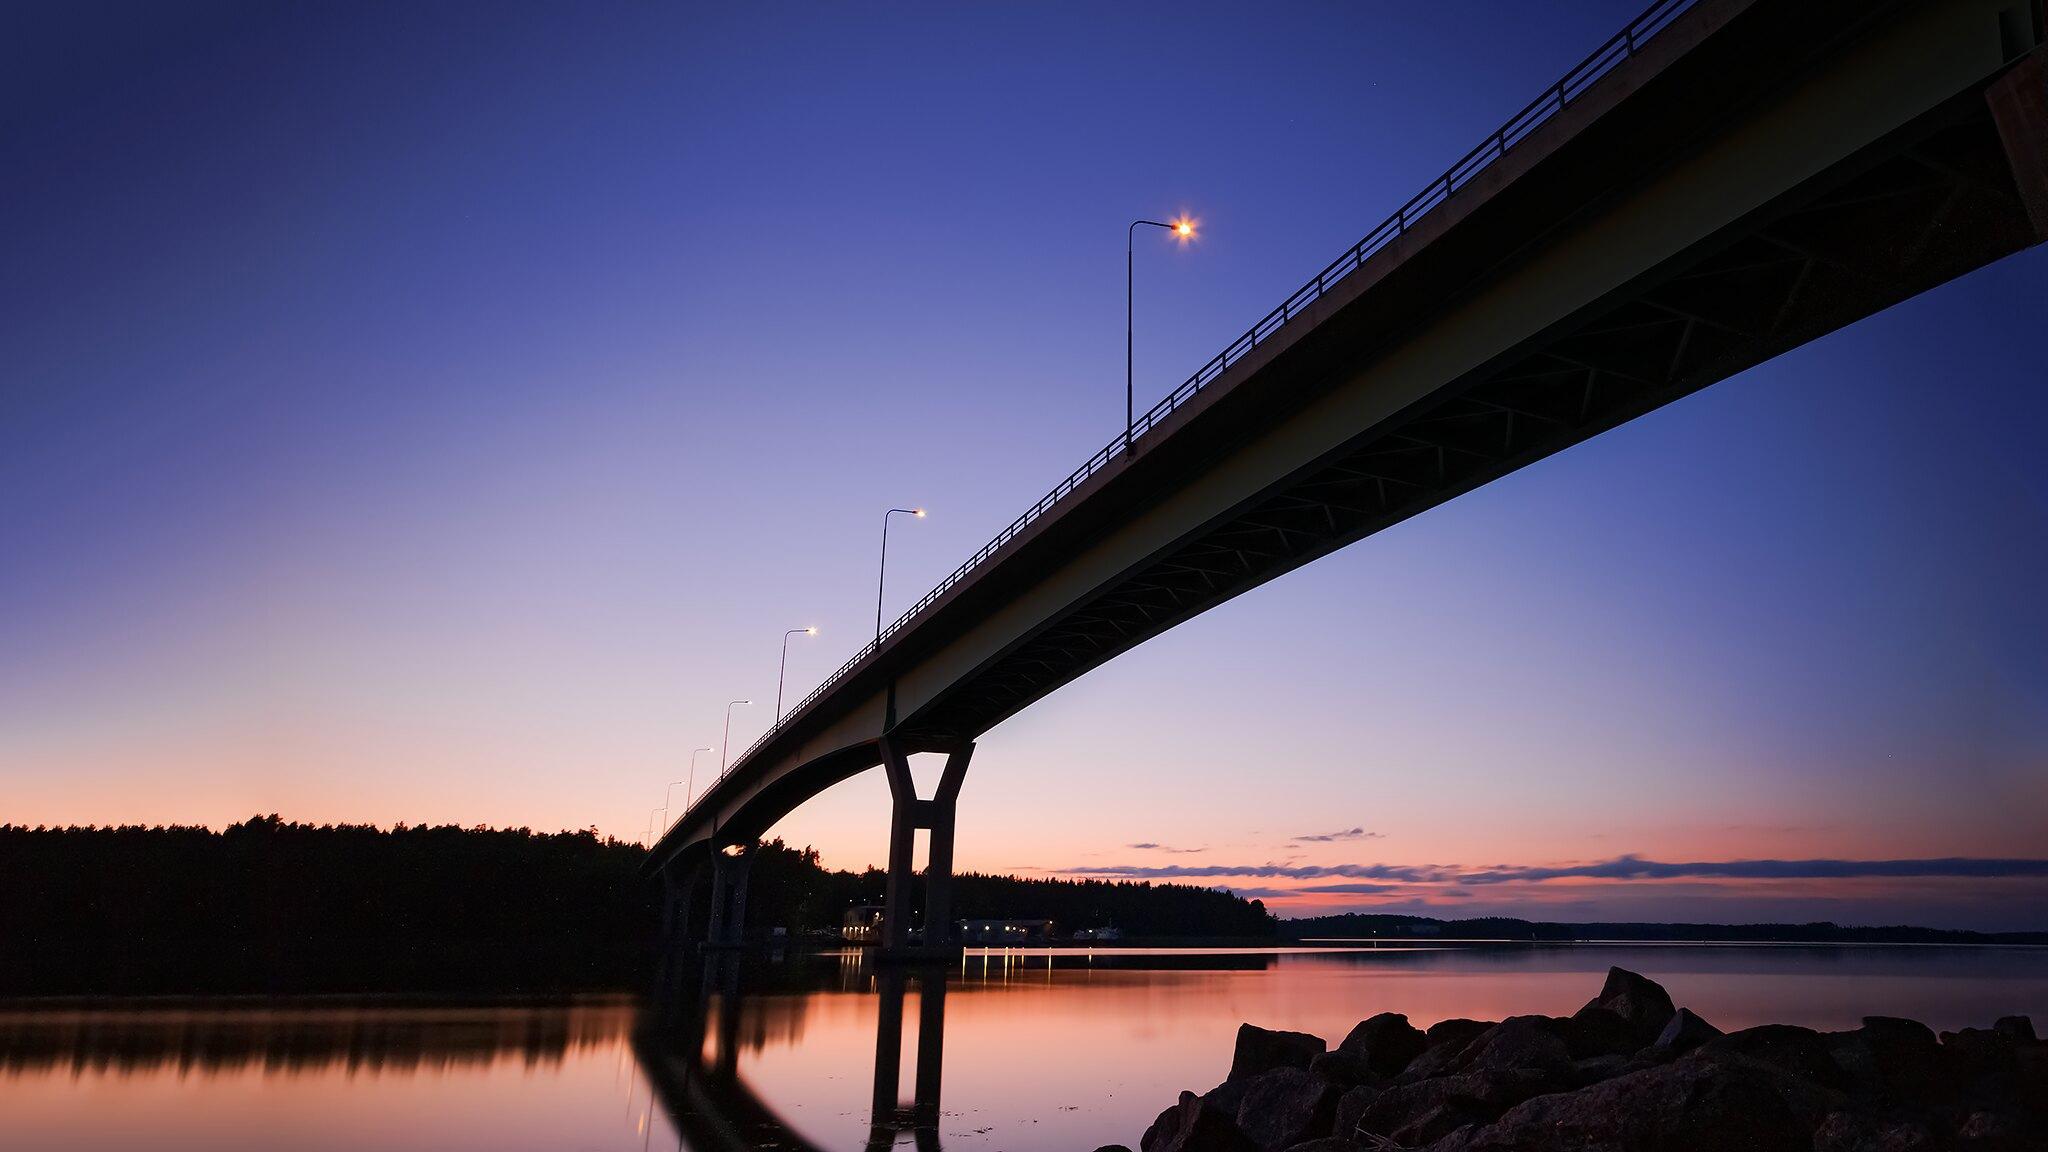 landscape sunset bridge